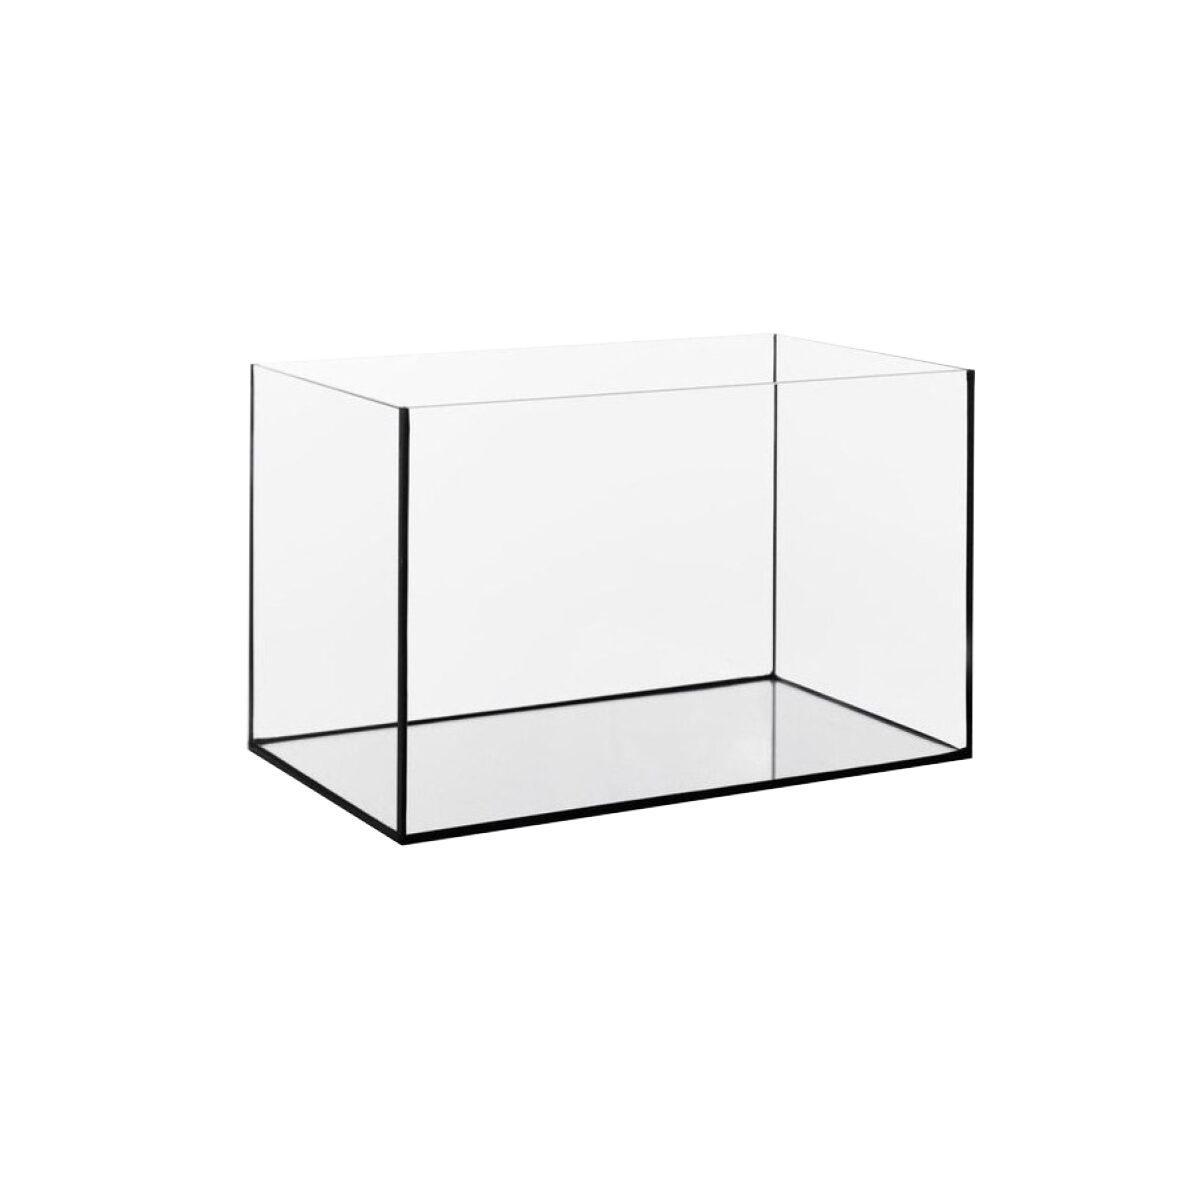 Aquarium Met Zwarte Kit 30x20x20 cm